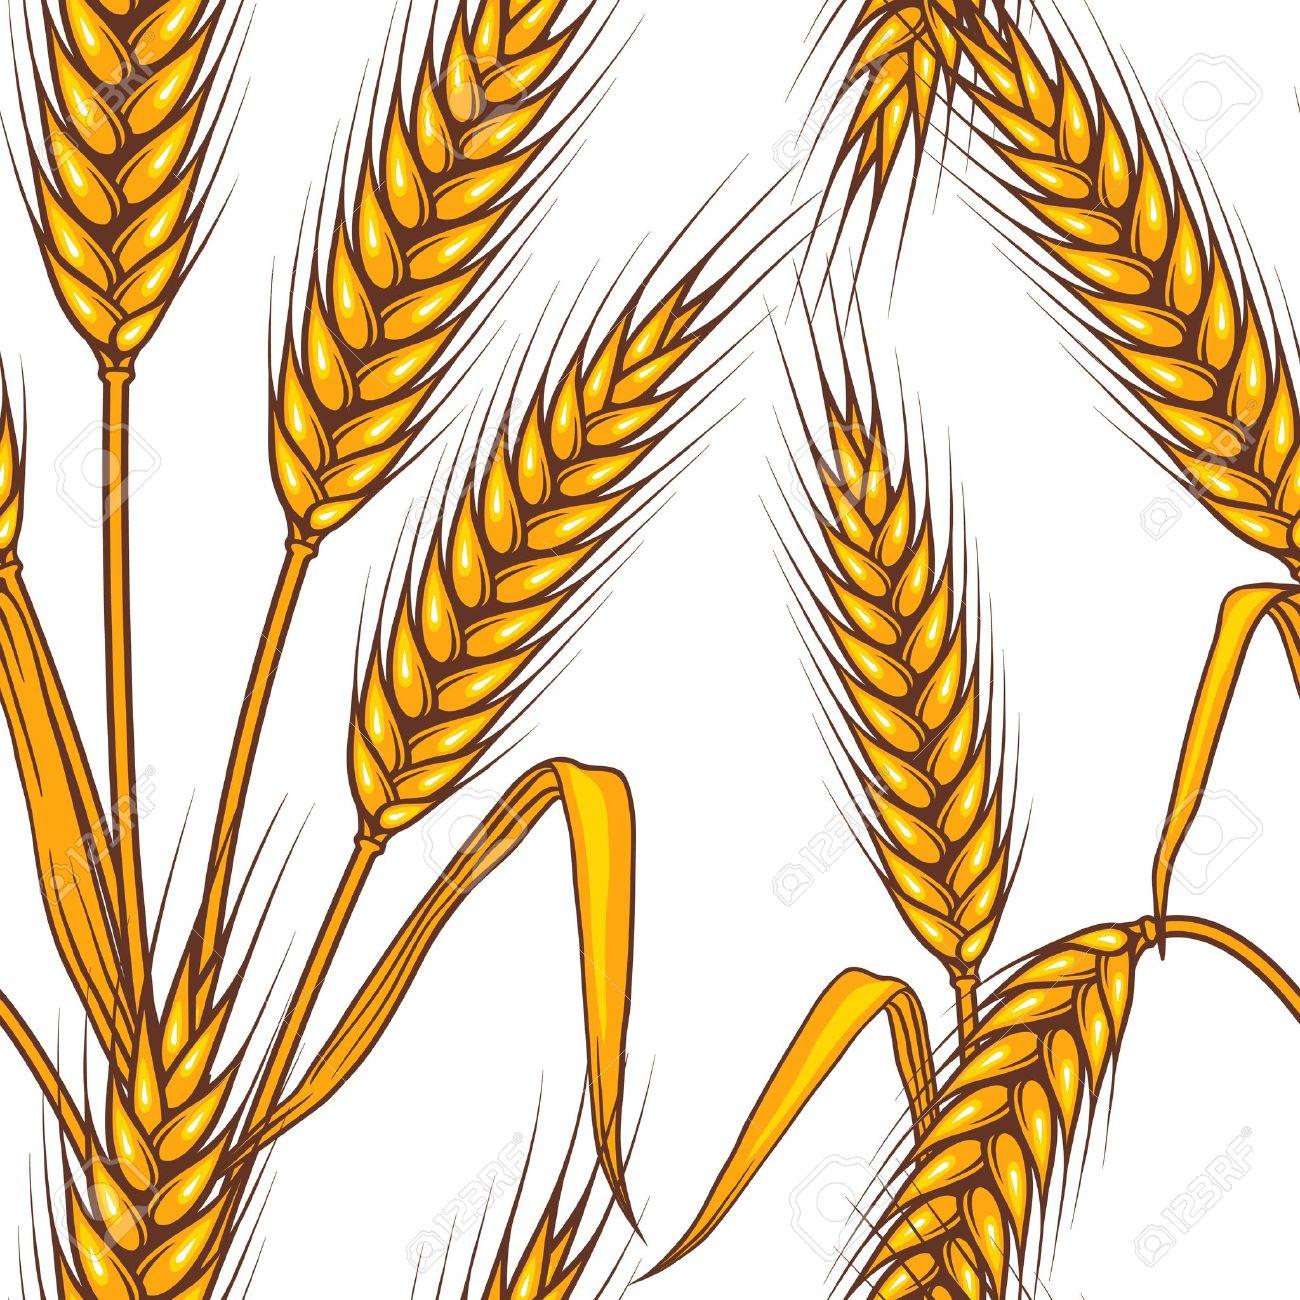 Getreide clipart #17, Download drawings